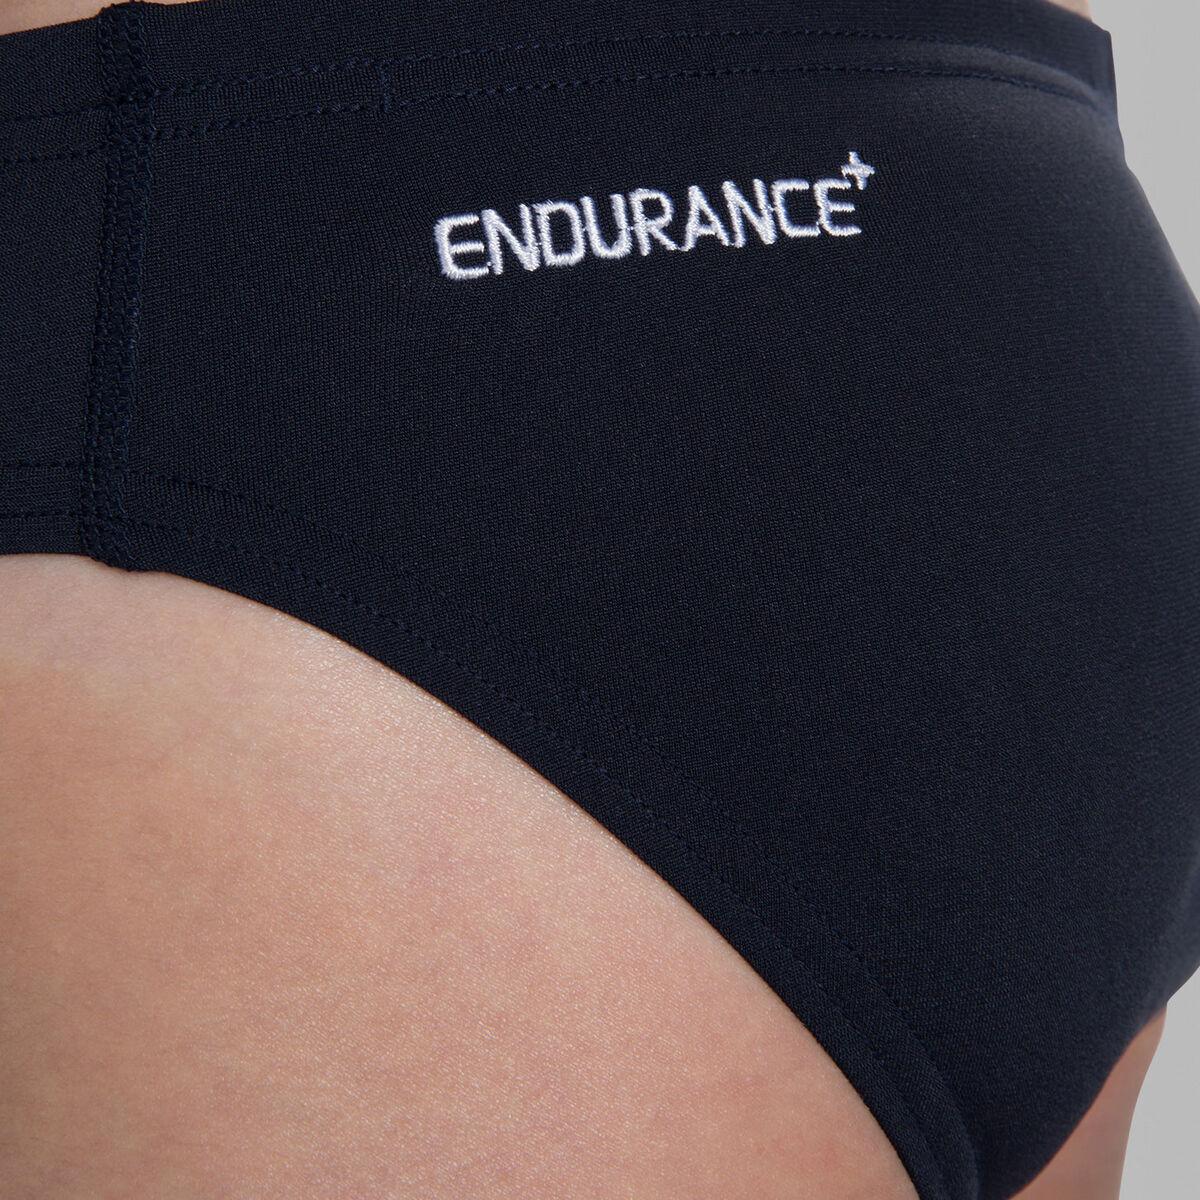 Essential Endurance+ 6.5cm Brief